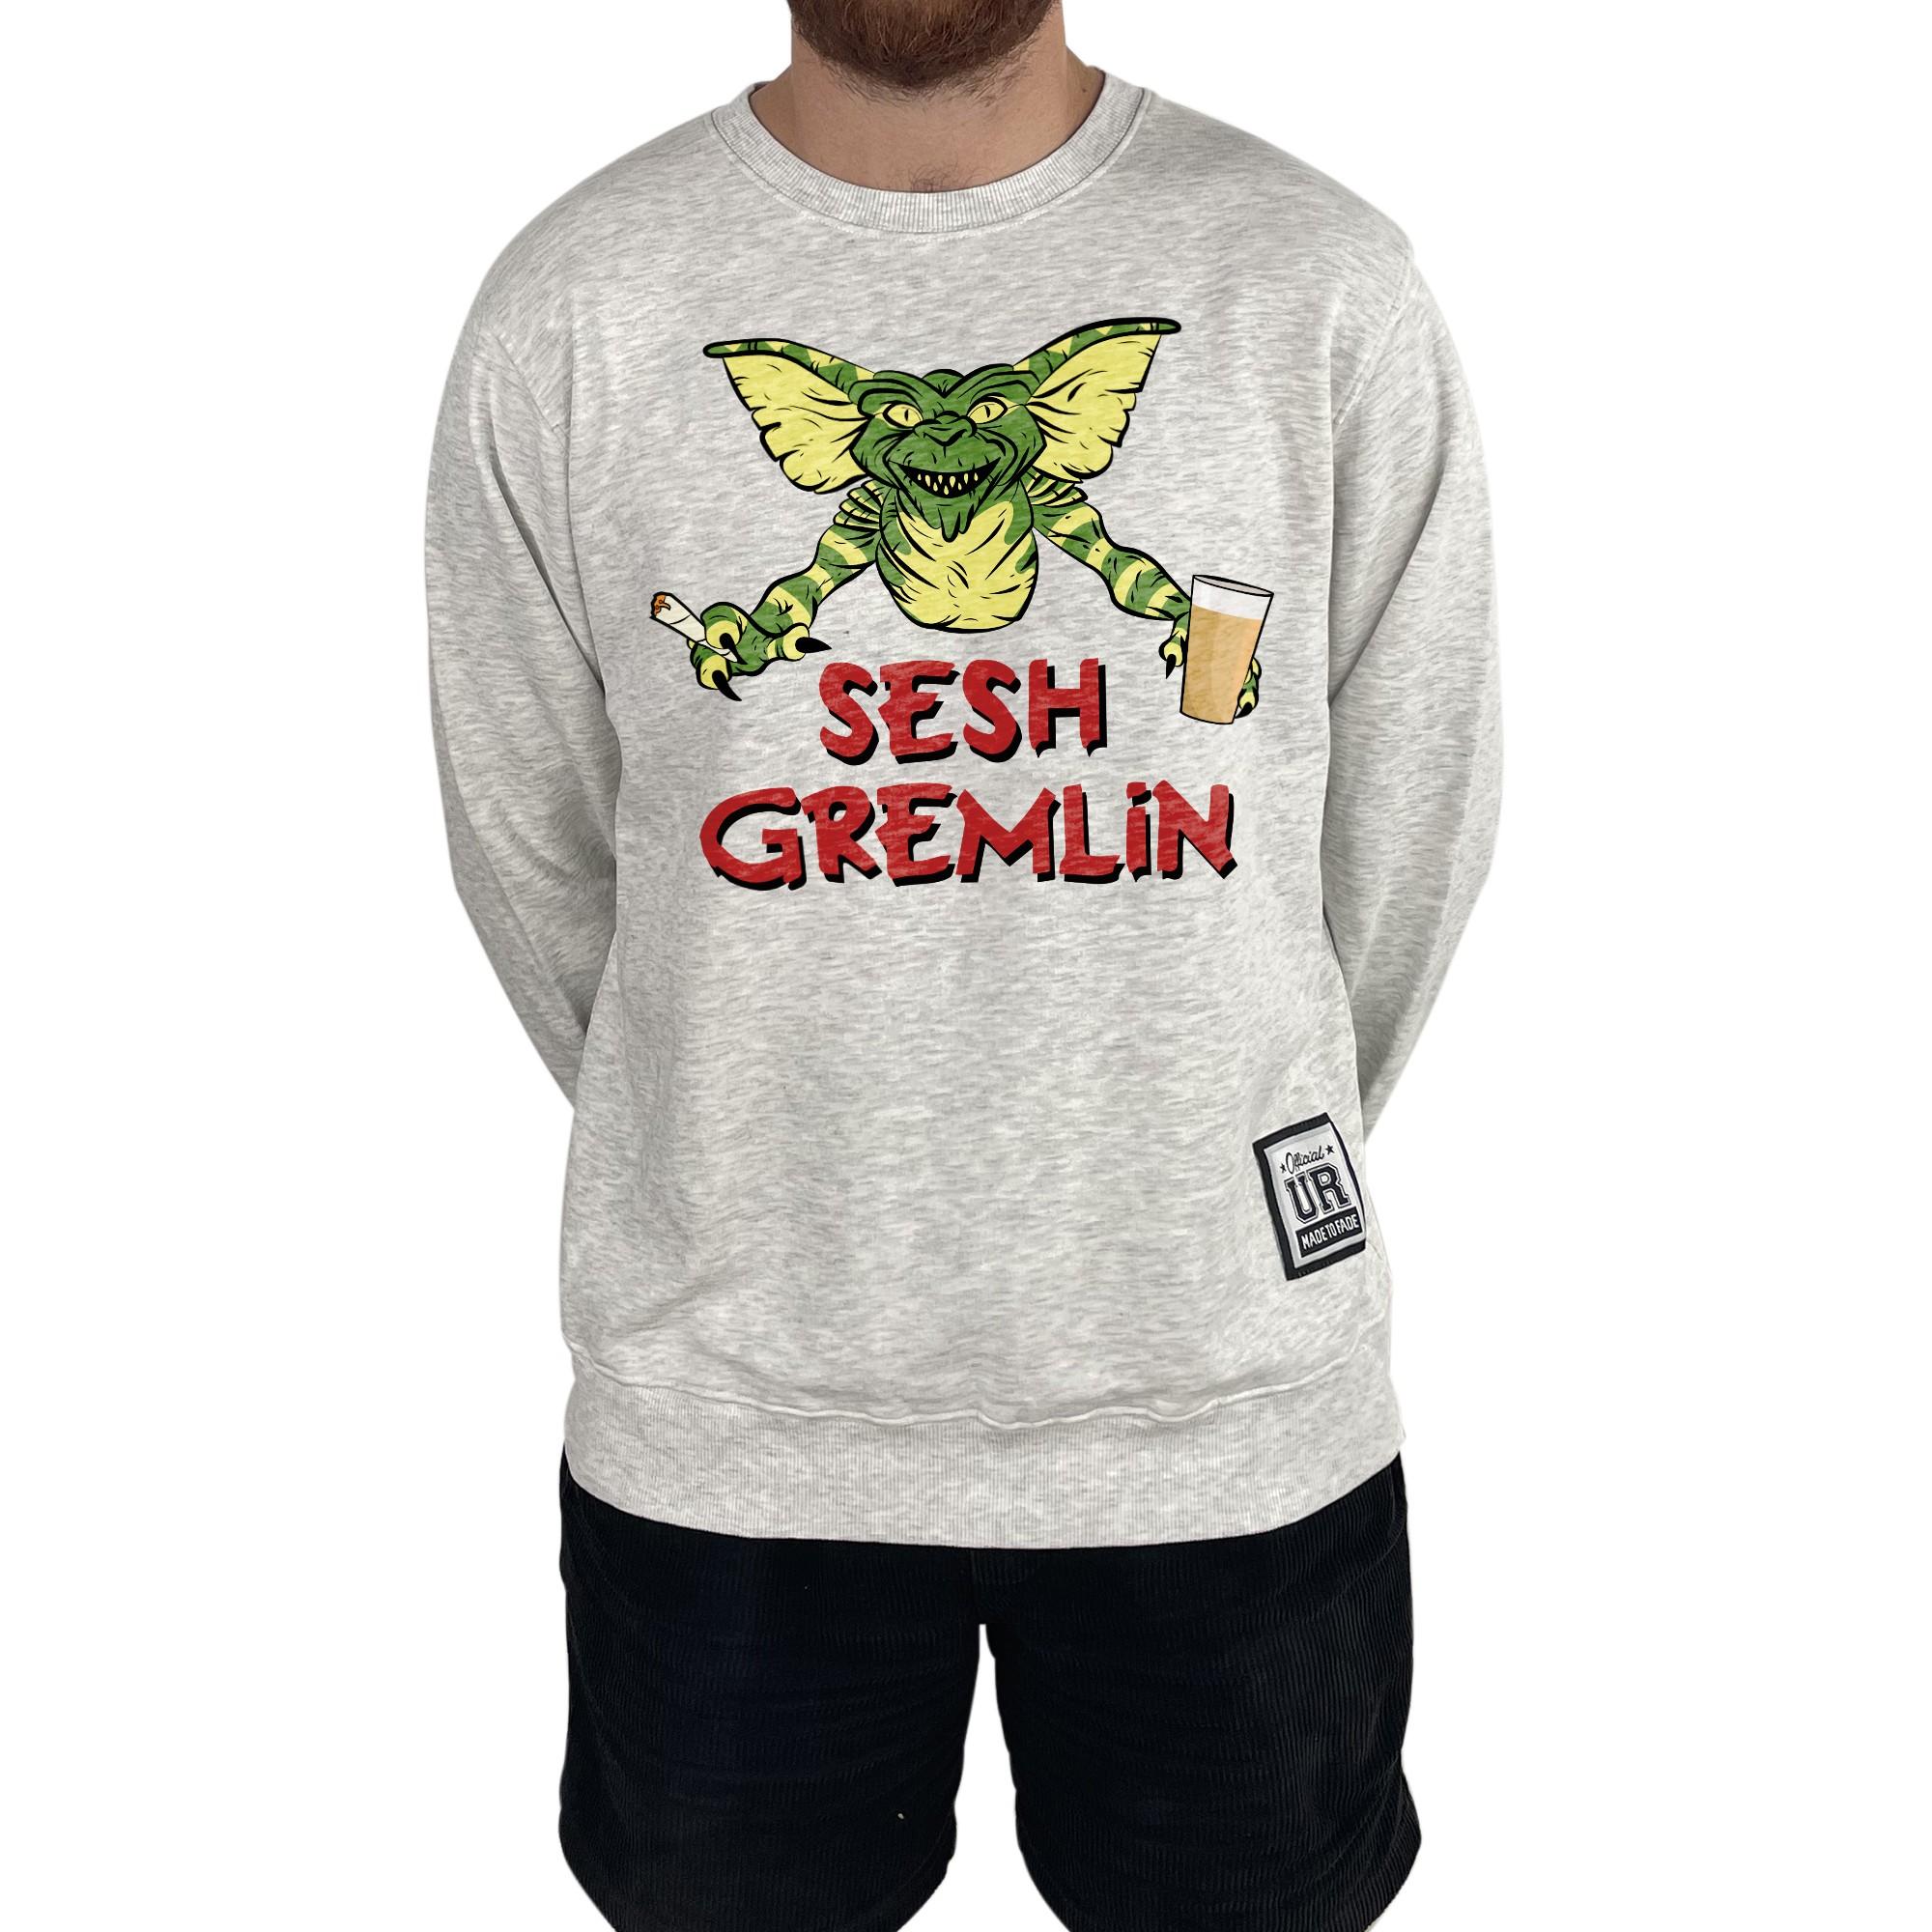 SESH GREMLIN WHITE MARLE CREW